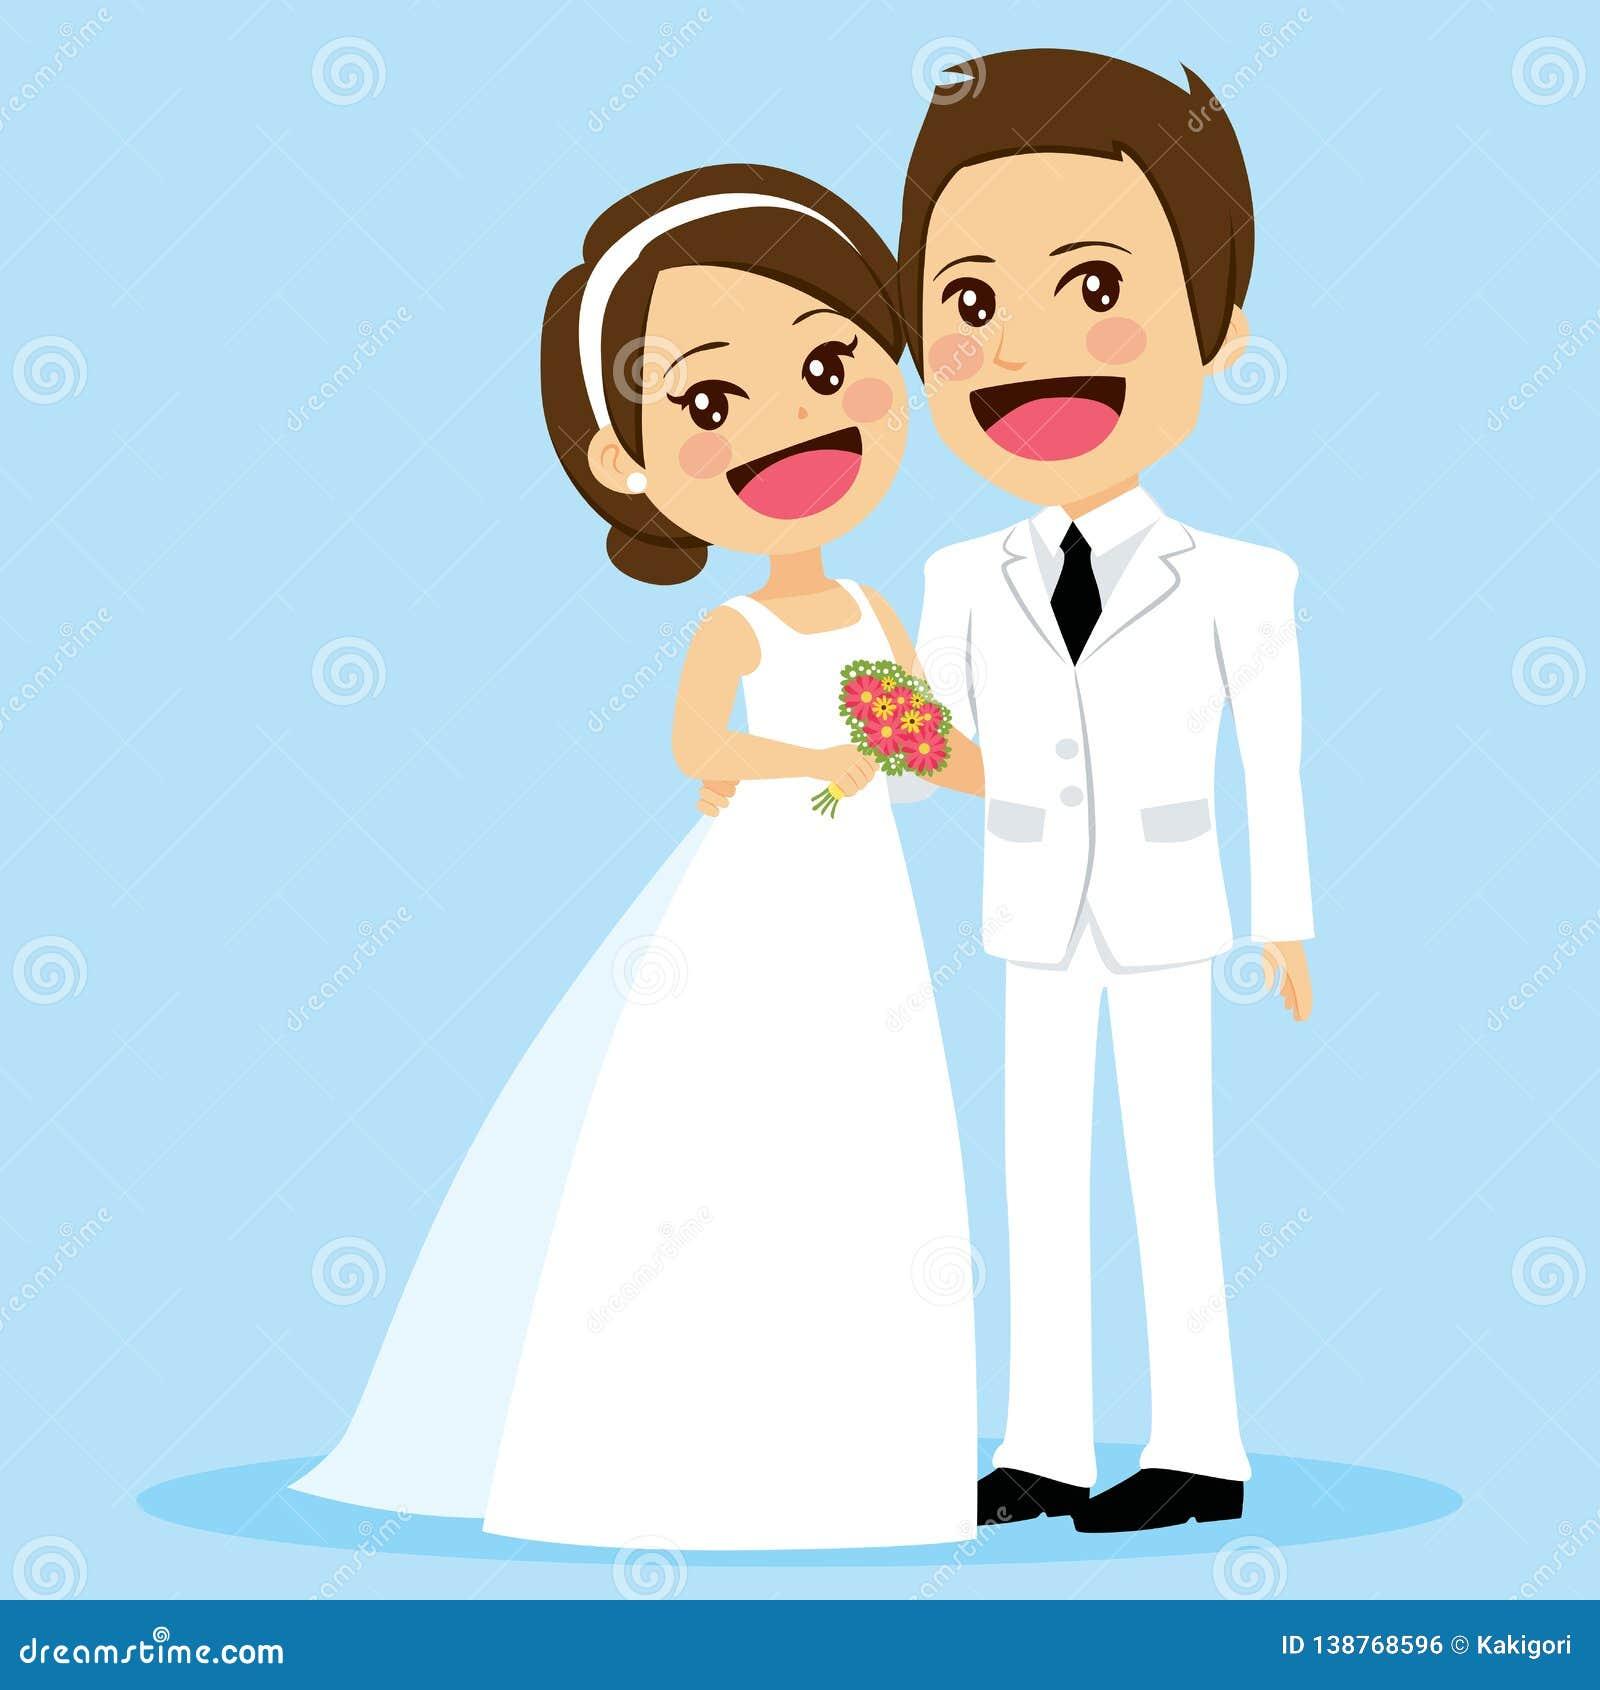 Cute Couple Wedding Standing Embracing Stock Vector Illustration Of Celebration Groom 138768596